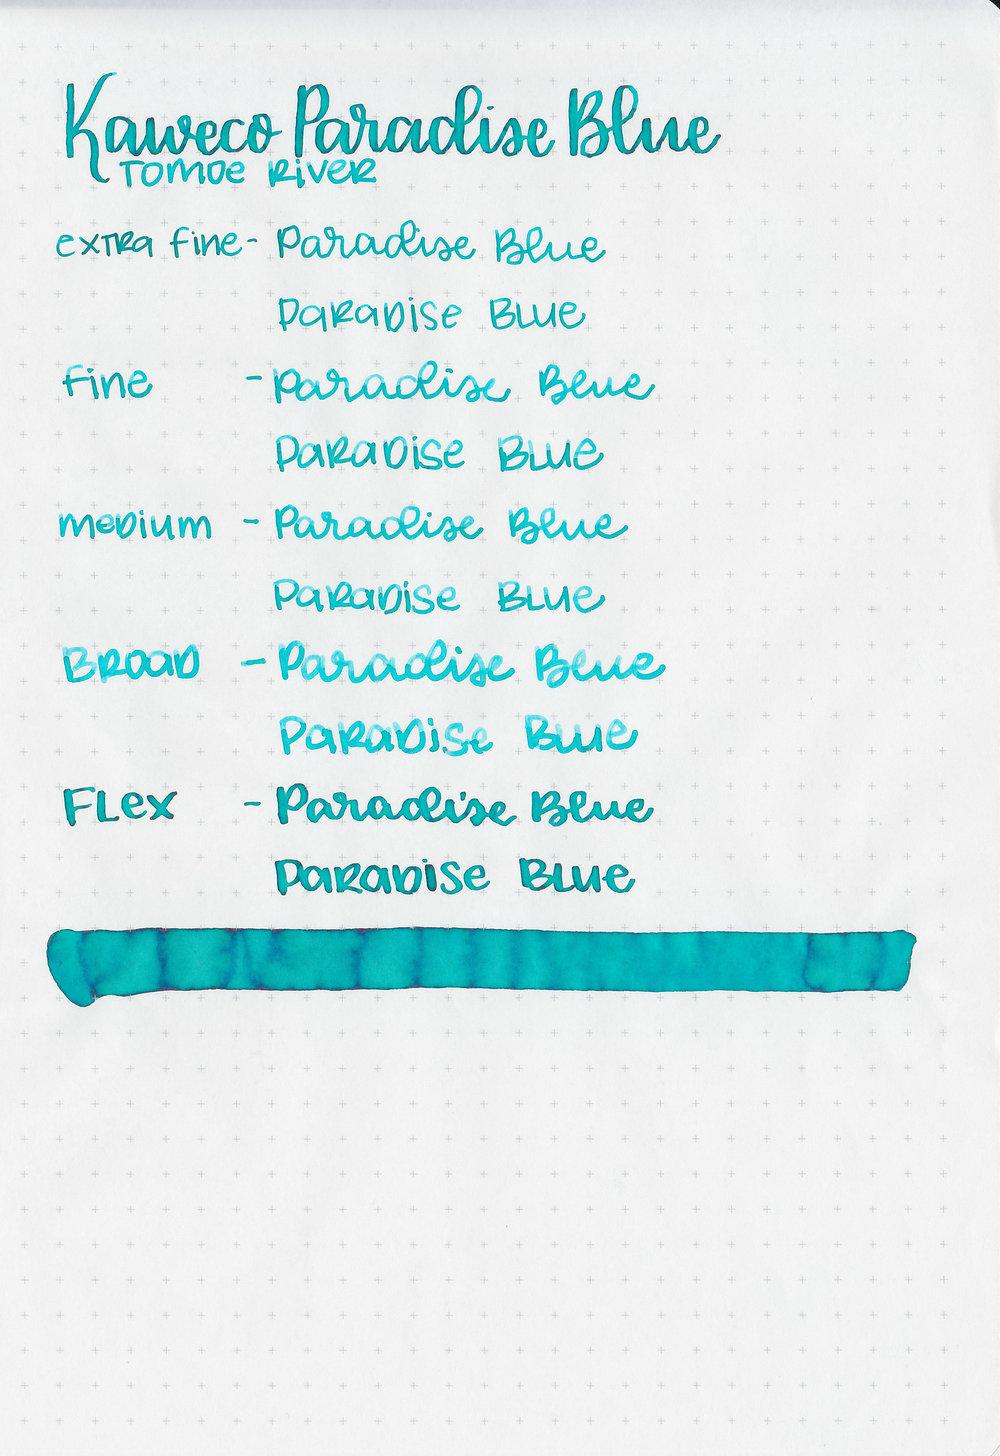 kw-paradise-blue-7.jpg